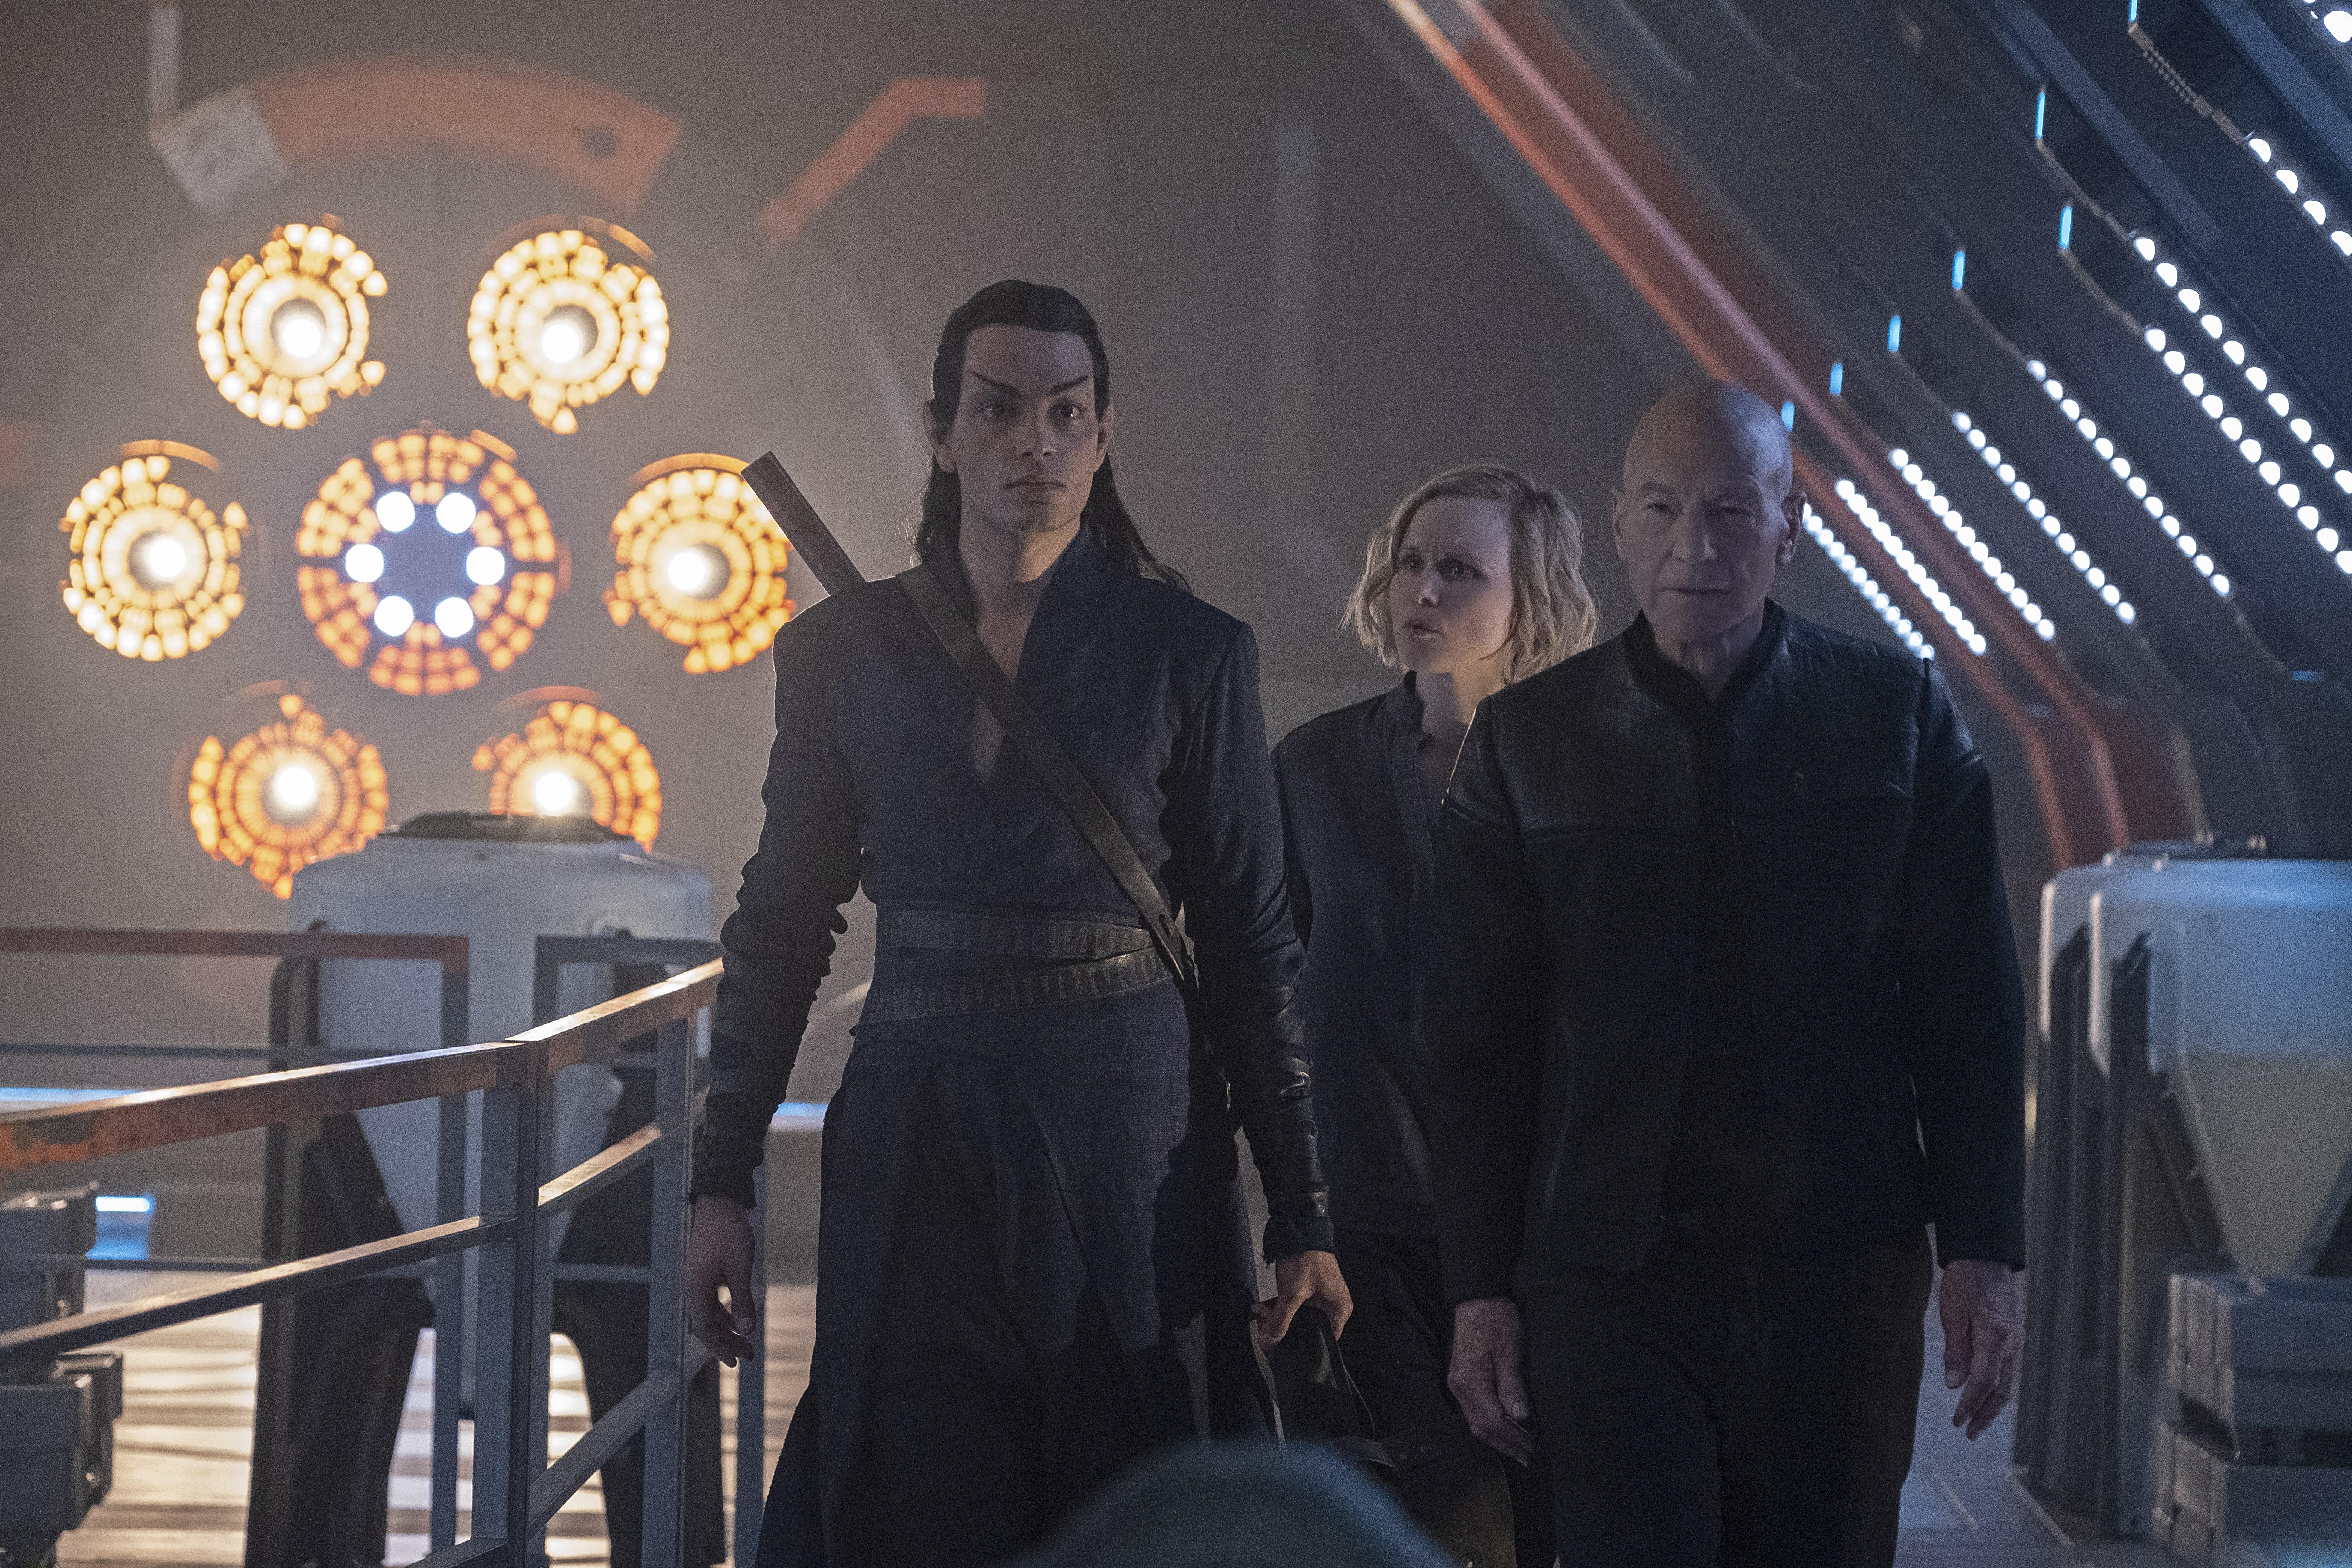 Artikel - Review Star Trek Picard - Still 1 - © 2019 Amazon.com Inc., or its affiliates